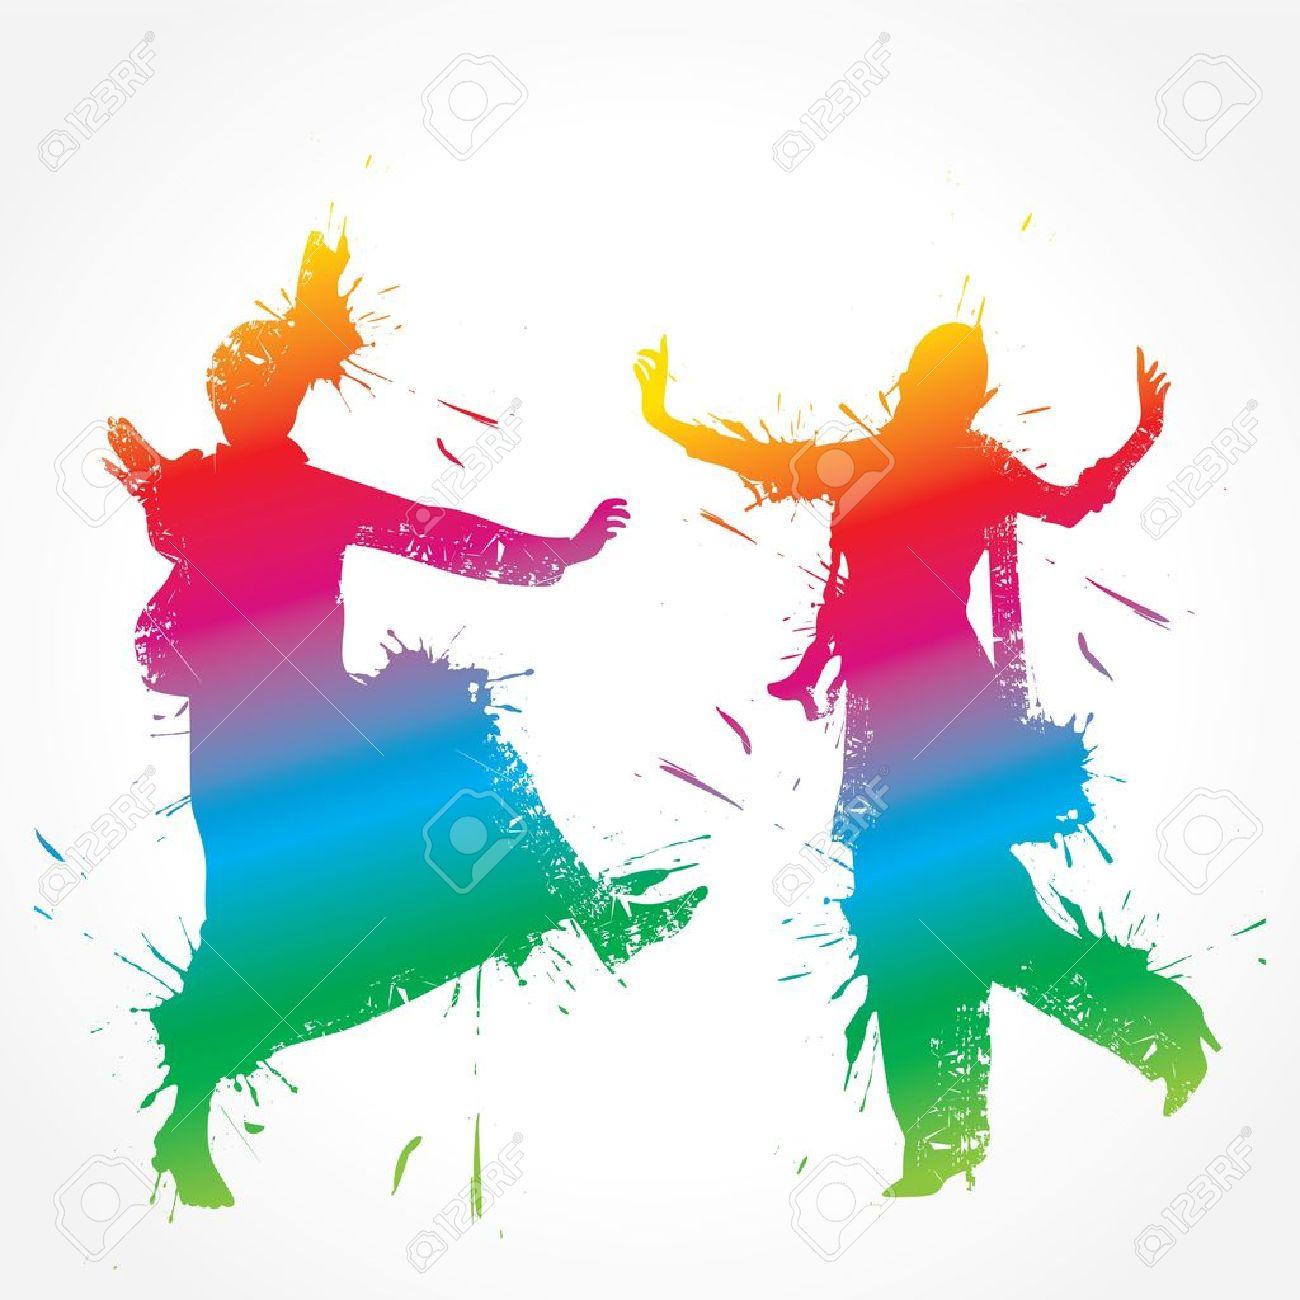 Colorful bhangra and gidda dancer stock vector Stock Vector - 19080366